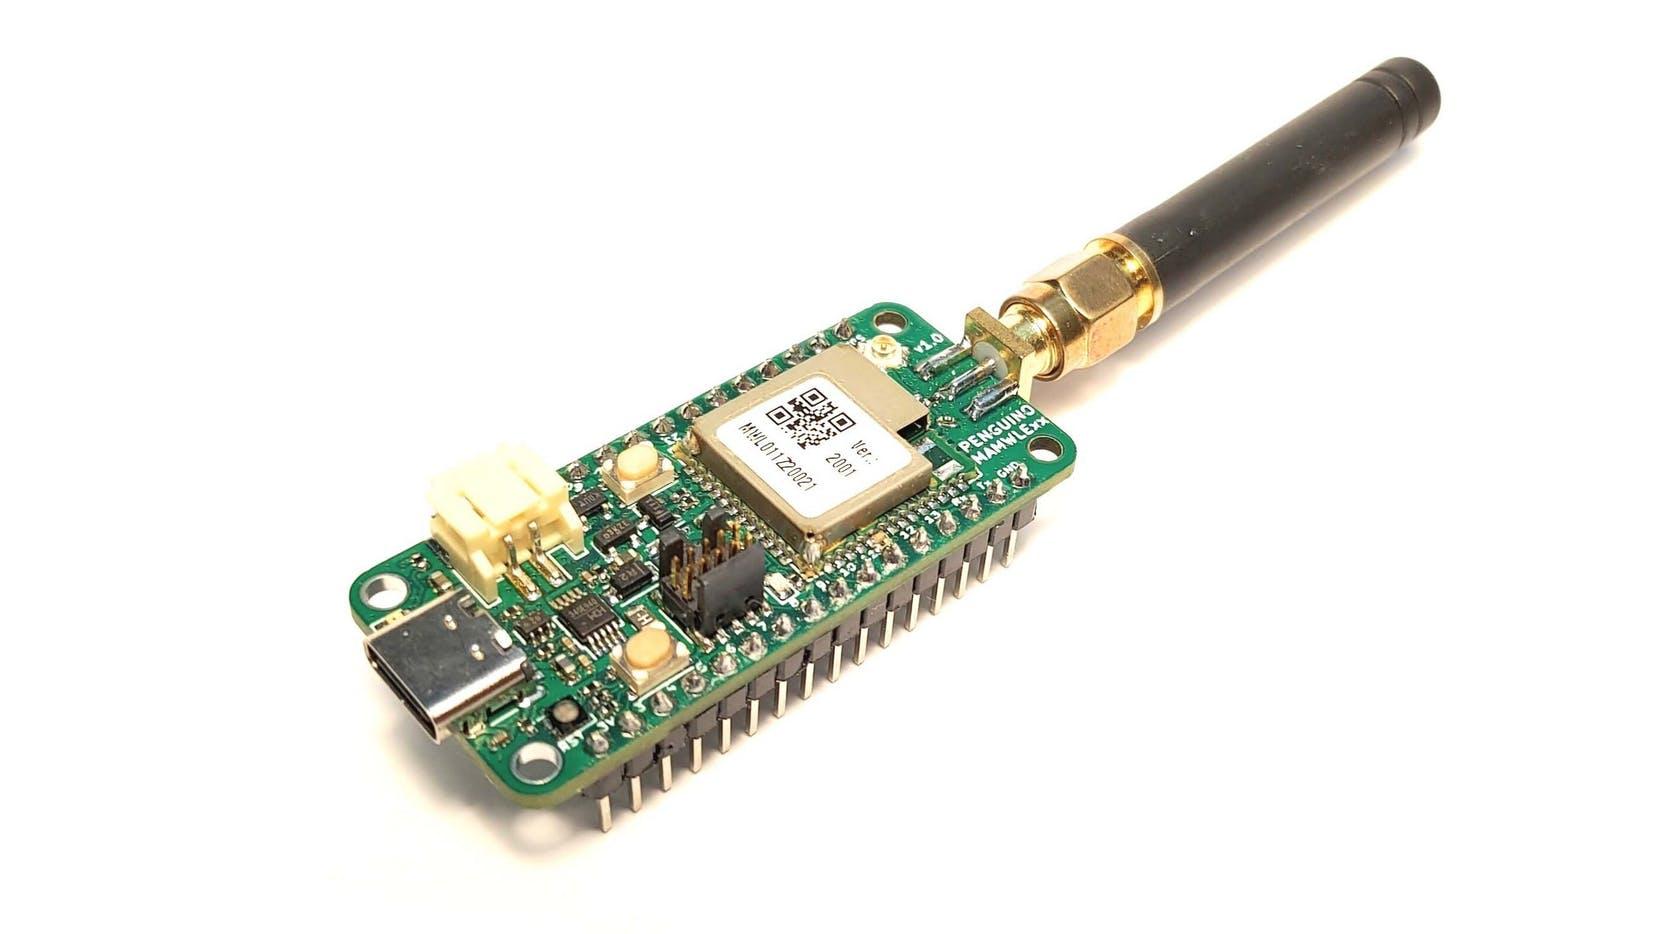 Penguino STM32WL MAMWLE-C1 LoRa development board Features Move Solutions' MAMWLE SoM